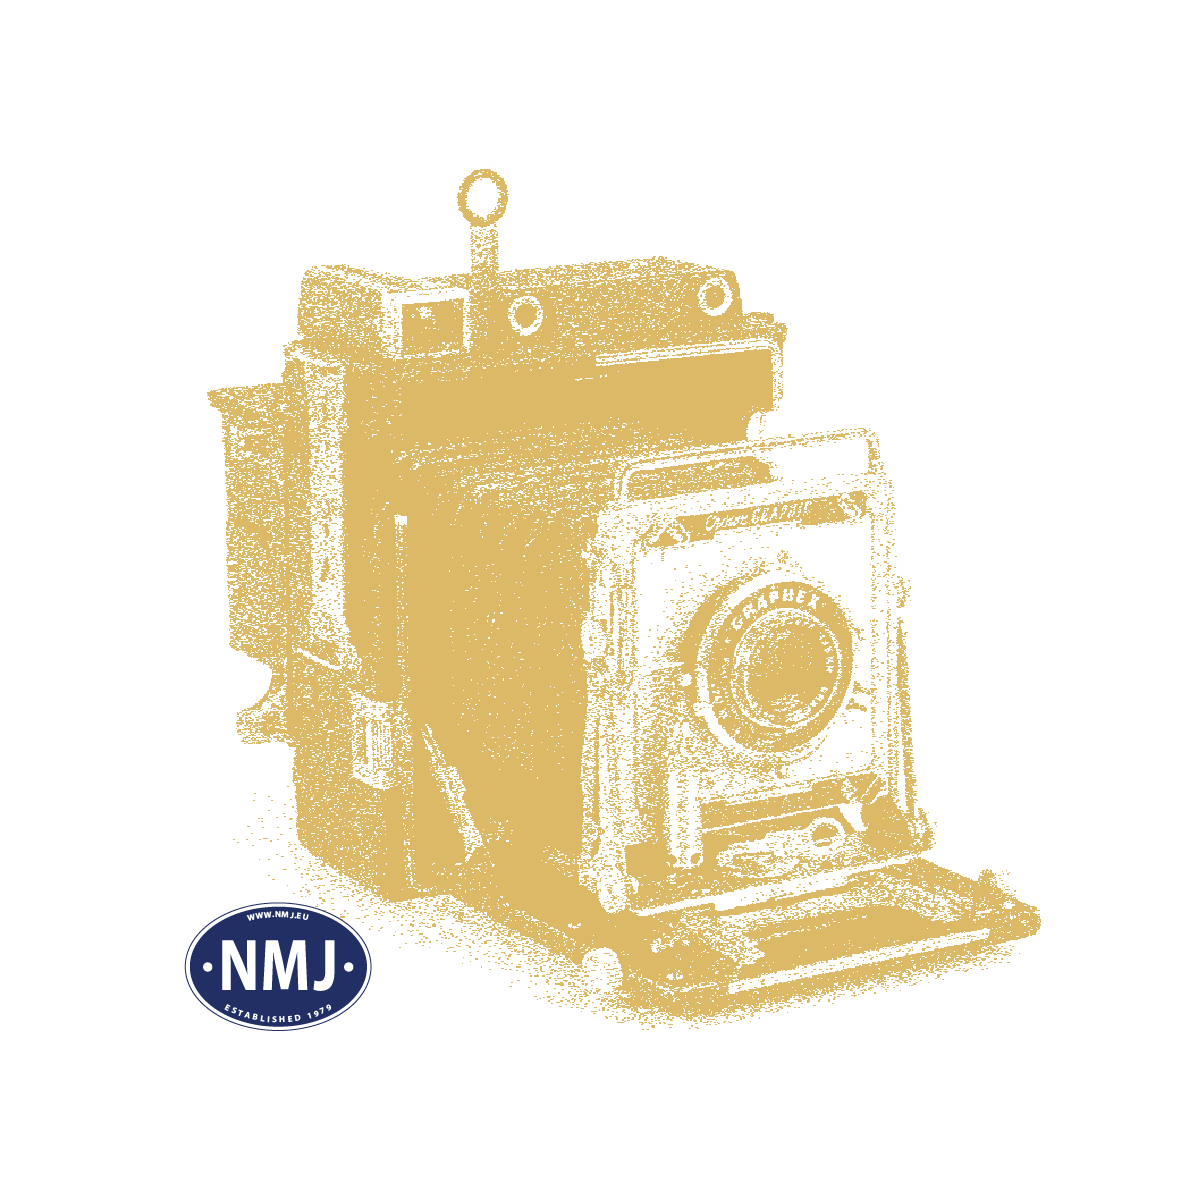 NMJT90209 - NMJ Topline MAV M61.007, DCC m/ Sound